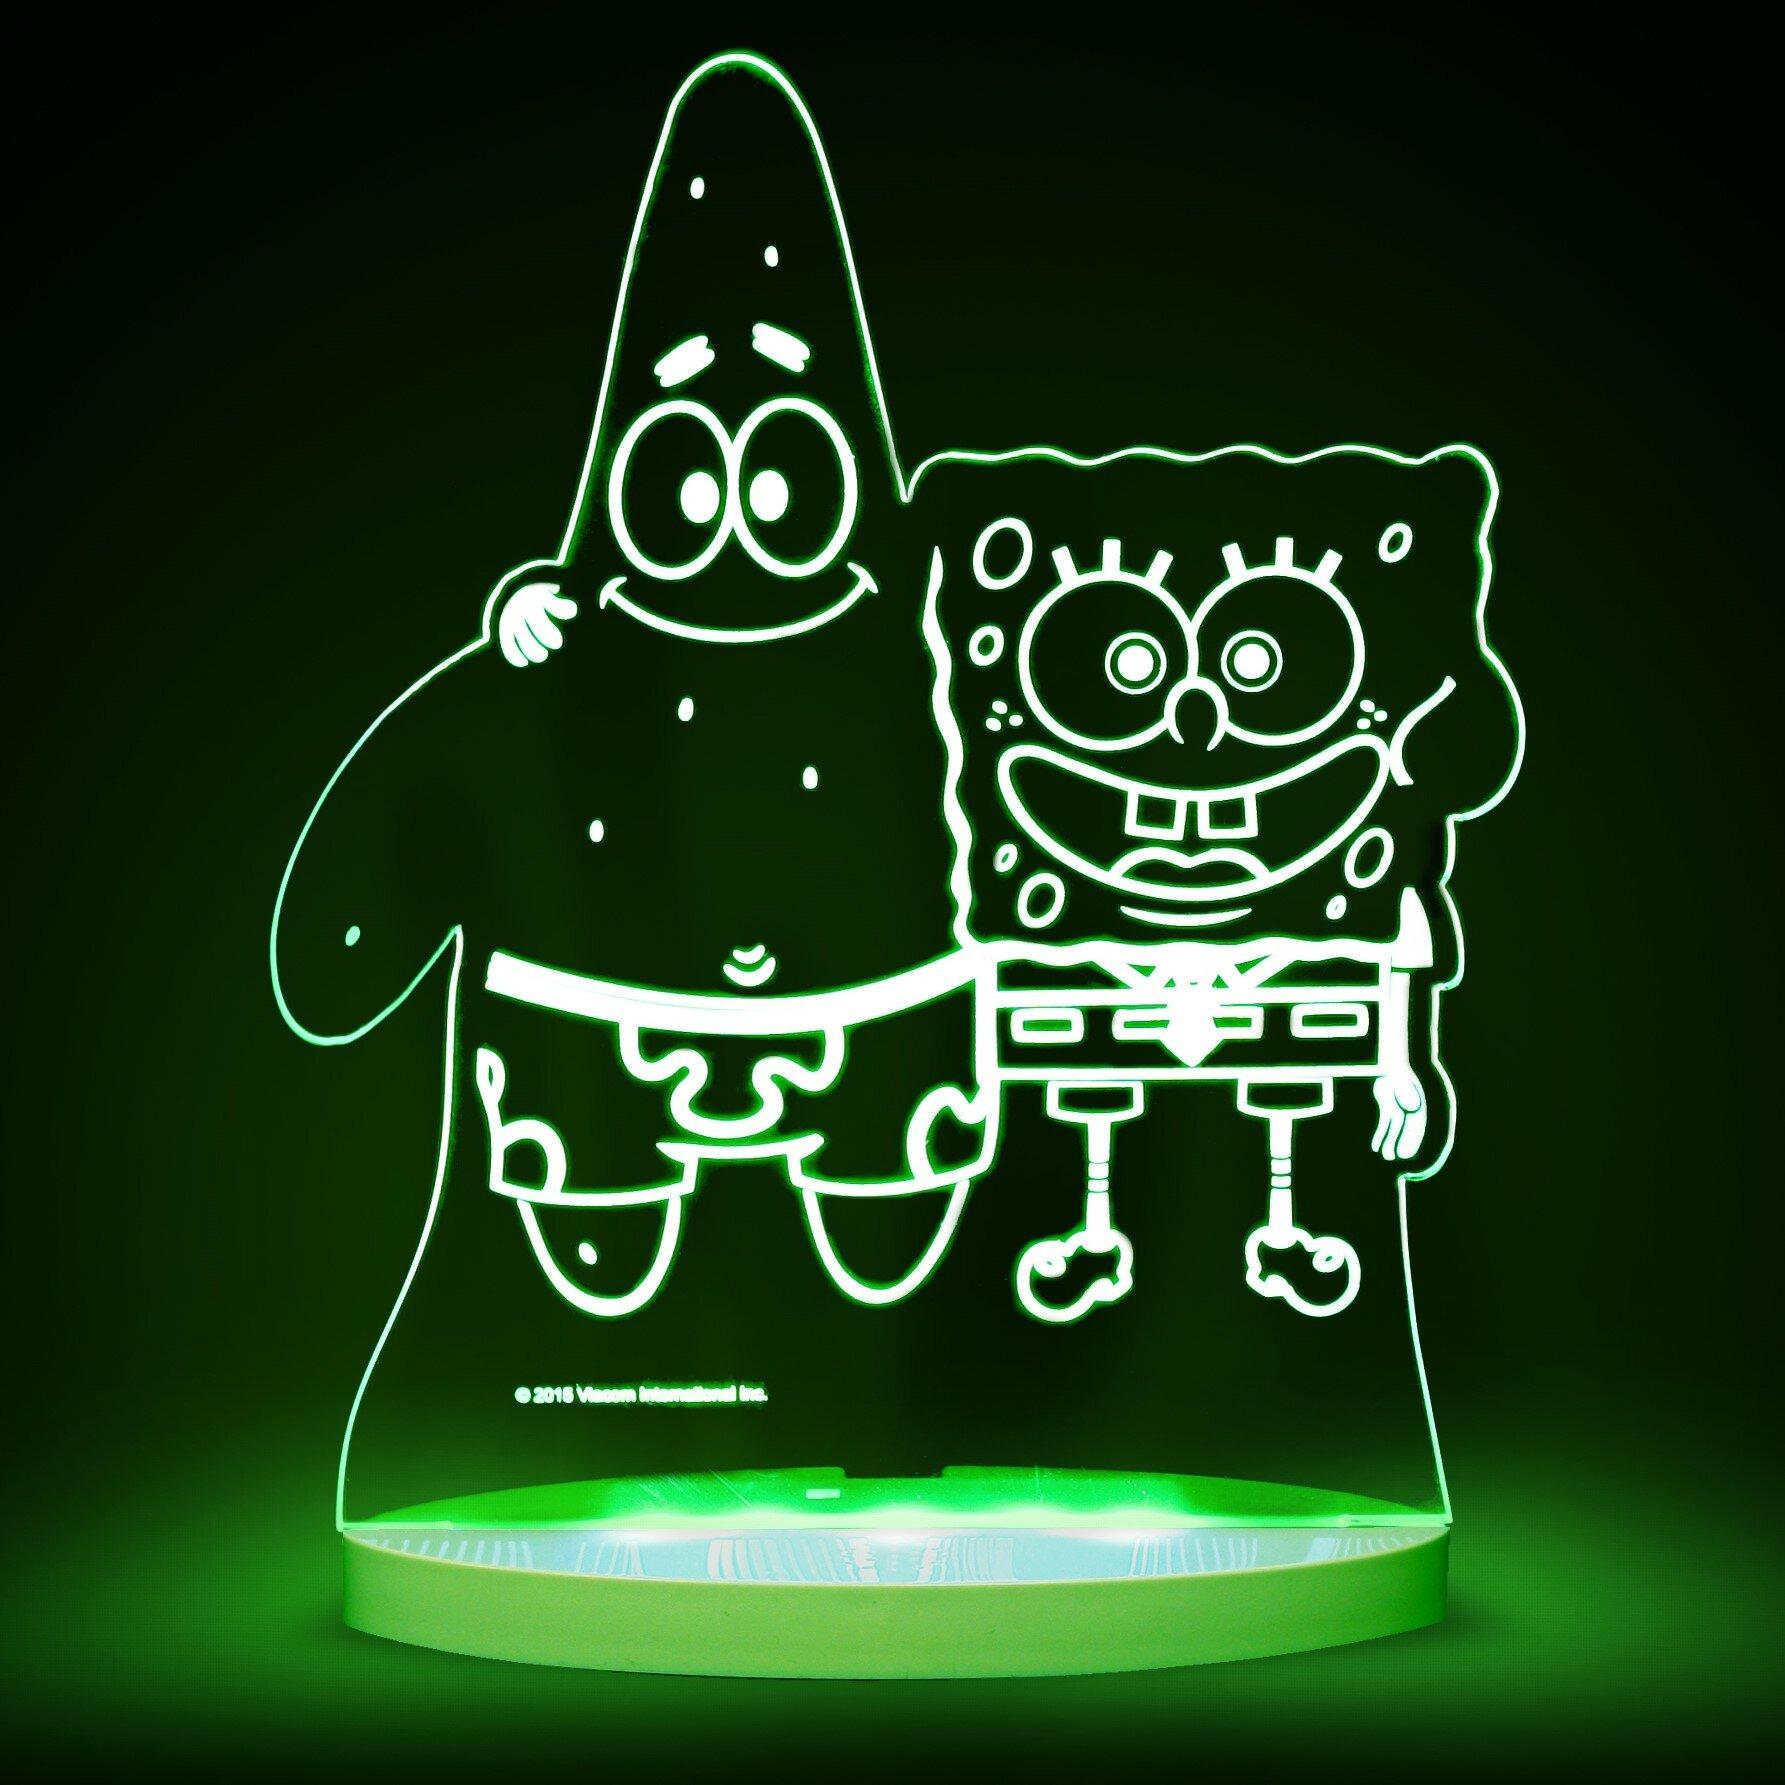 Spongebob squarepants bathroom accessories - Spongebob Squarepants Bathroom Accessories Nickelodeon Spongebob Squarepants And Patrick Led 3 Light Night Light